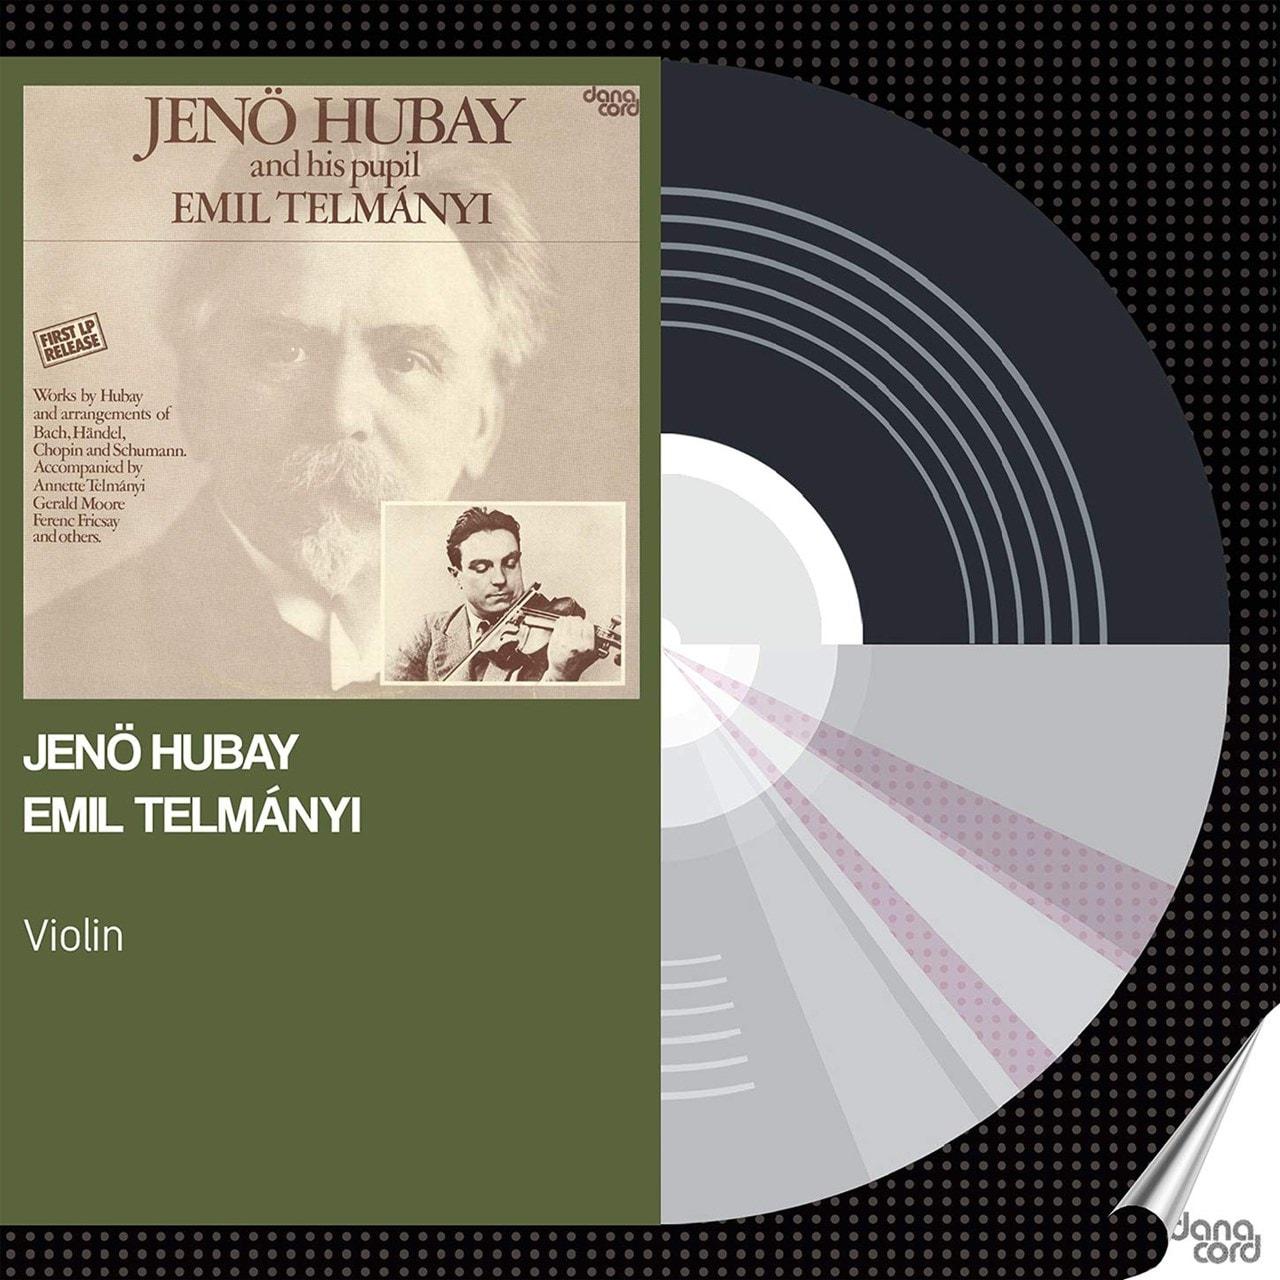 Jeno Hubay and His Pupil Emil Telmanyi - 1